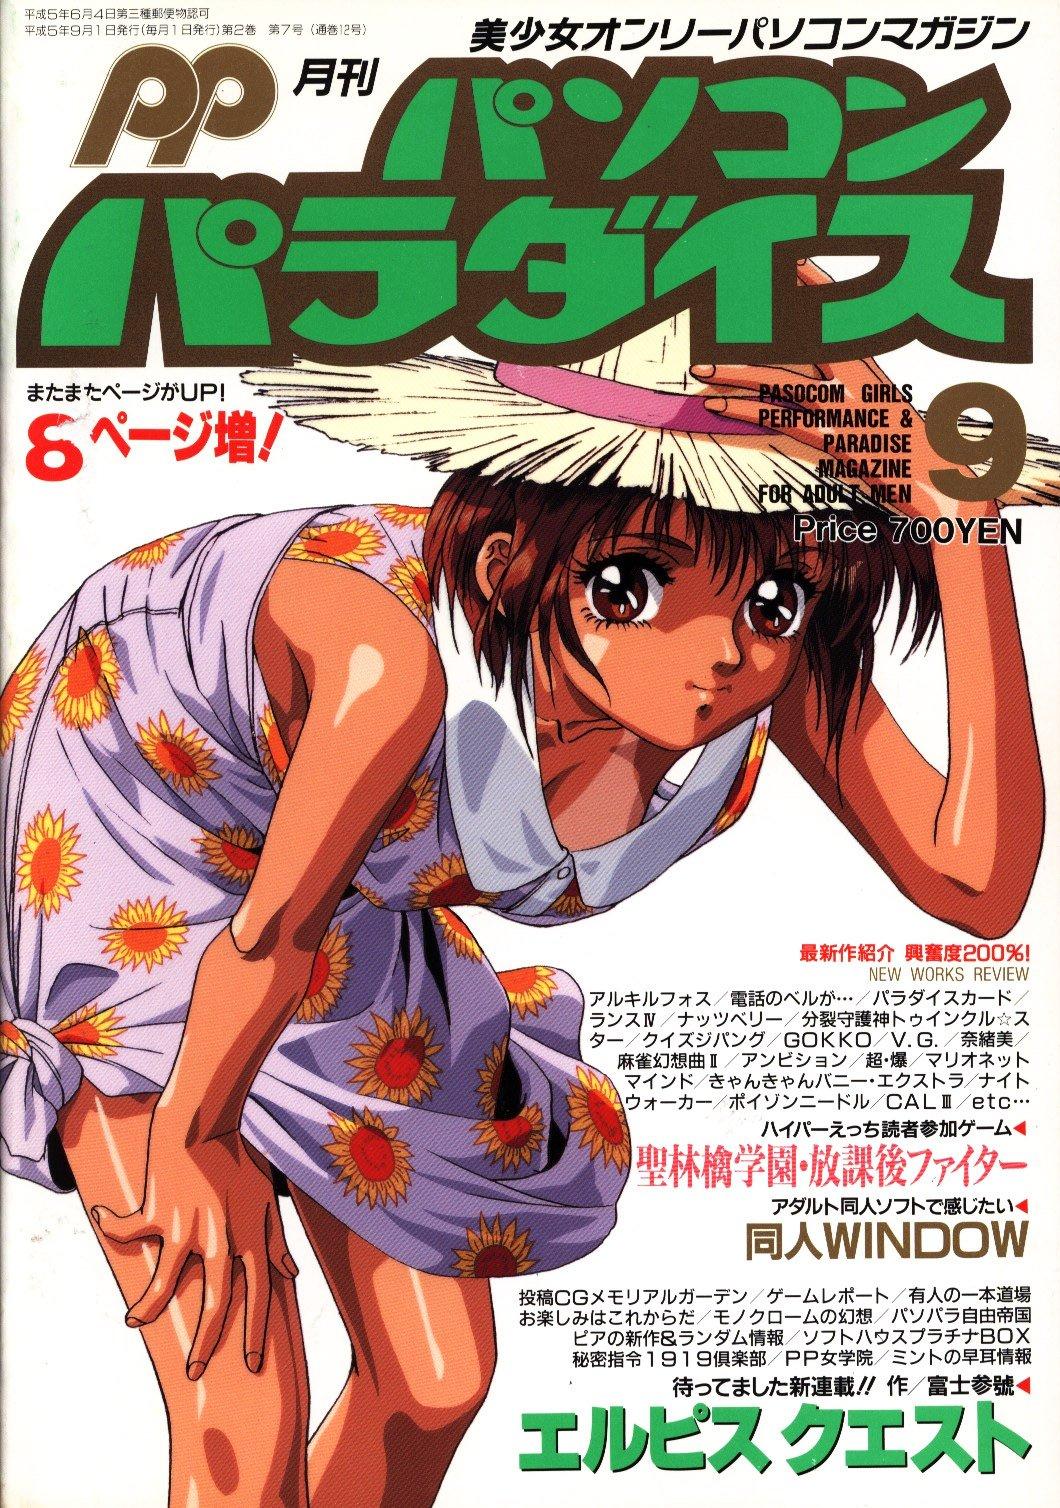 Pasocom Paradise Vol.016 (September 1993)